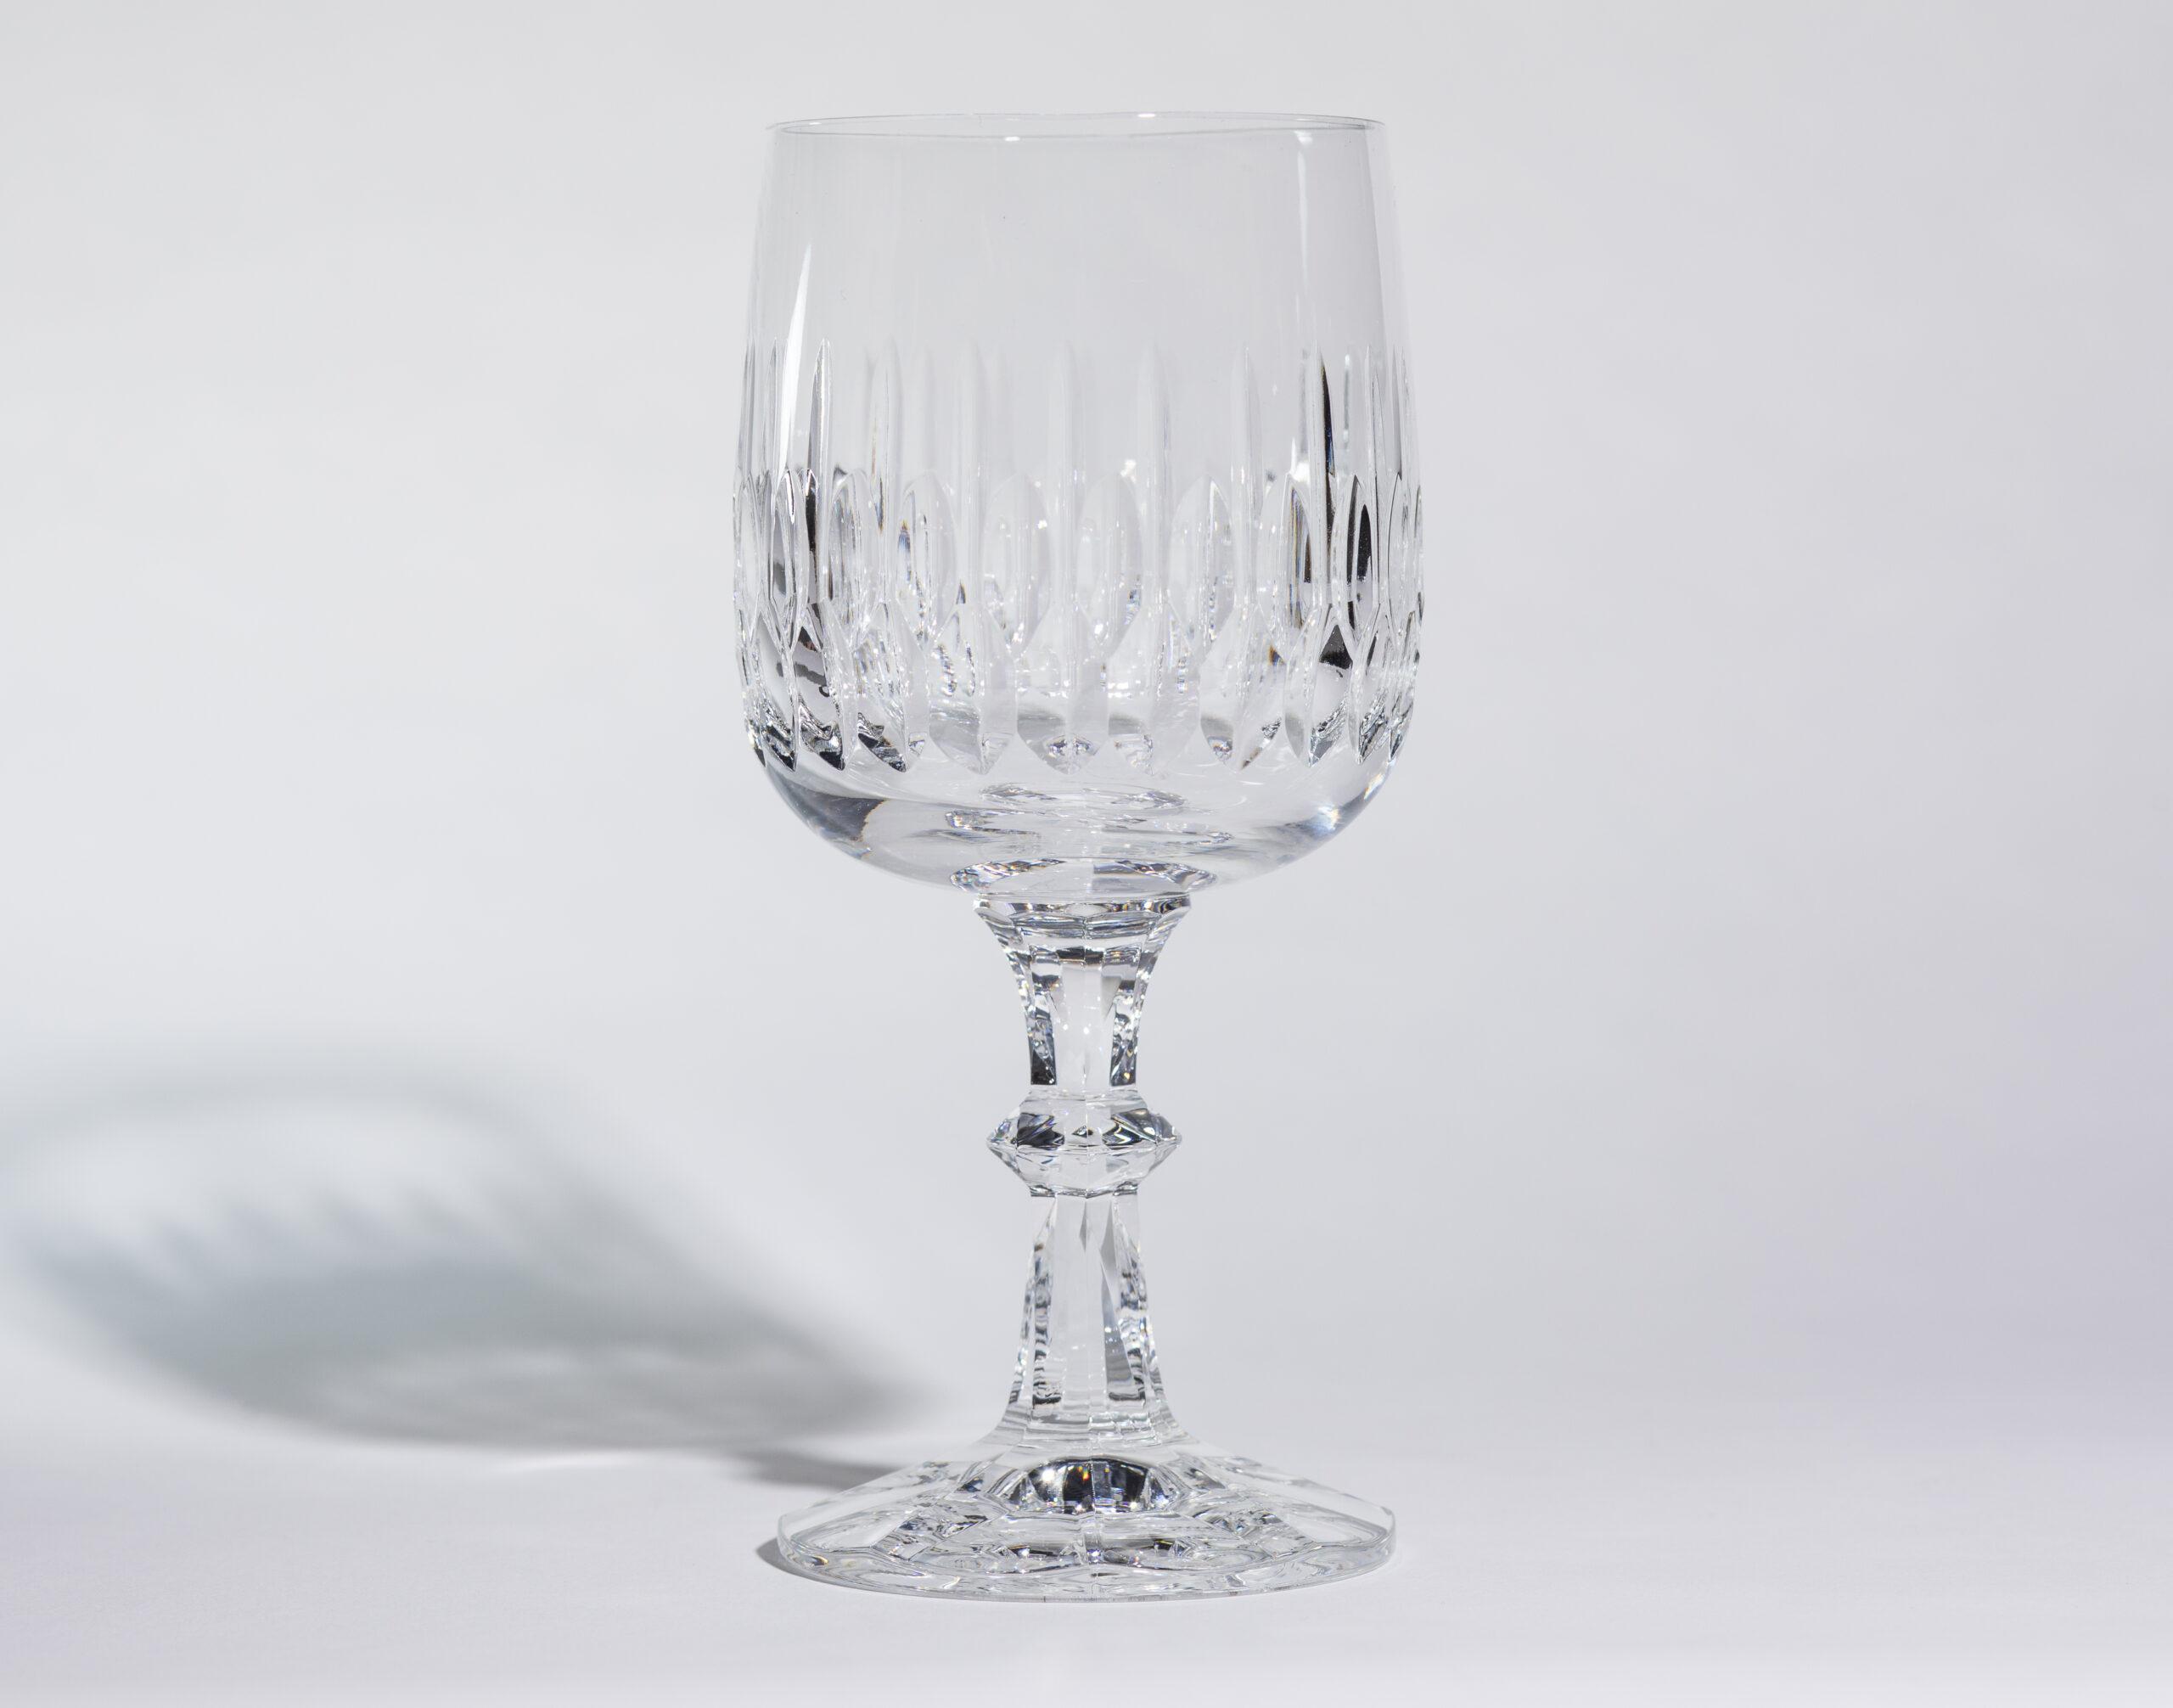 Wine glasses (10oz, stemmed)